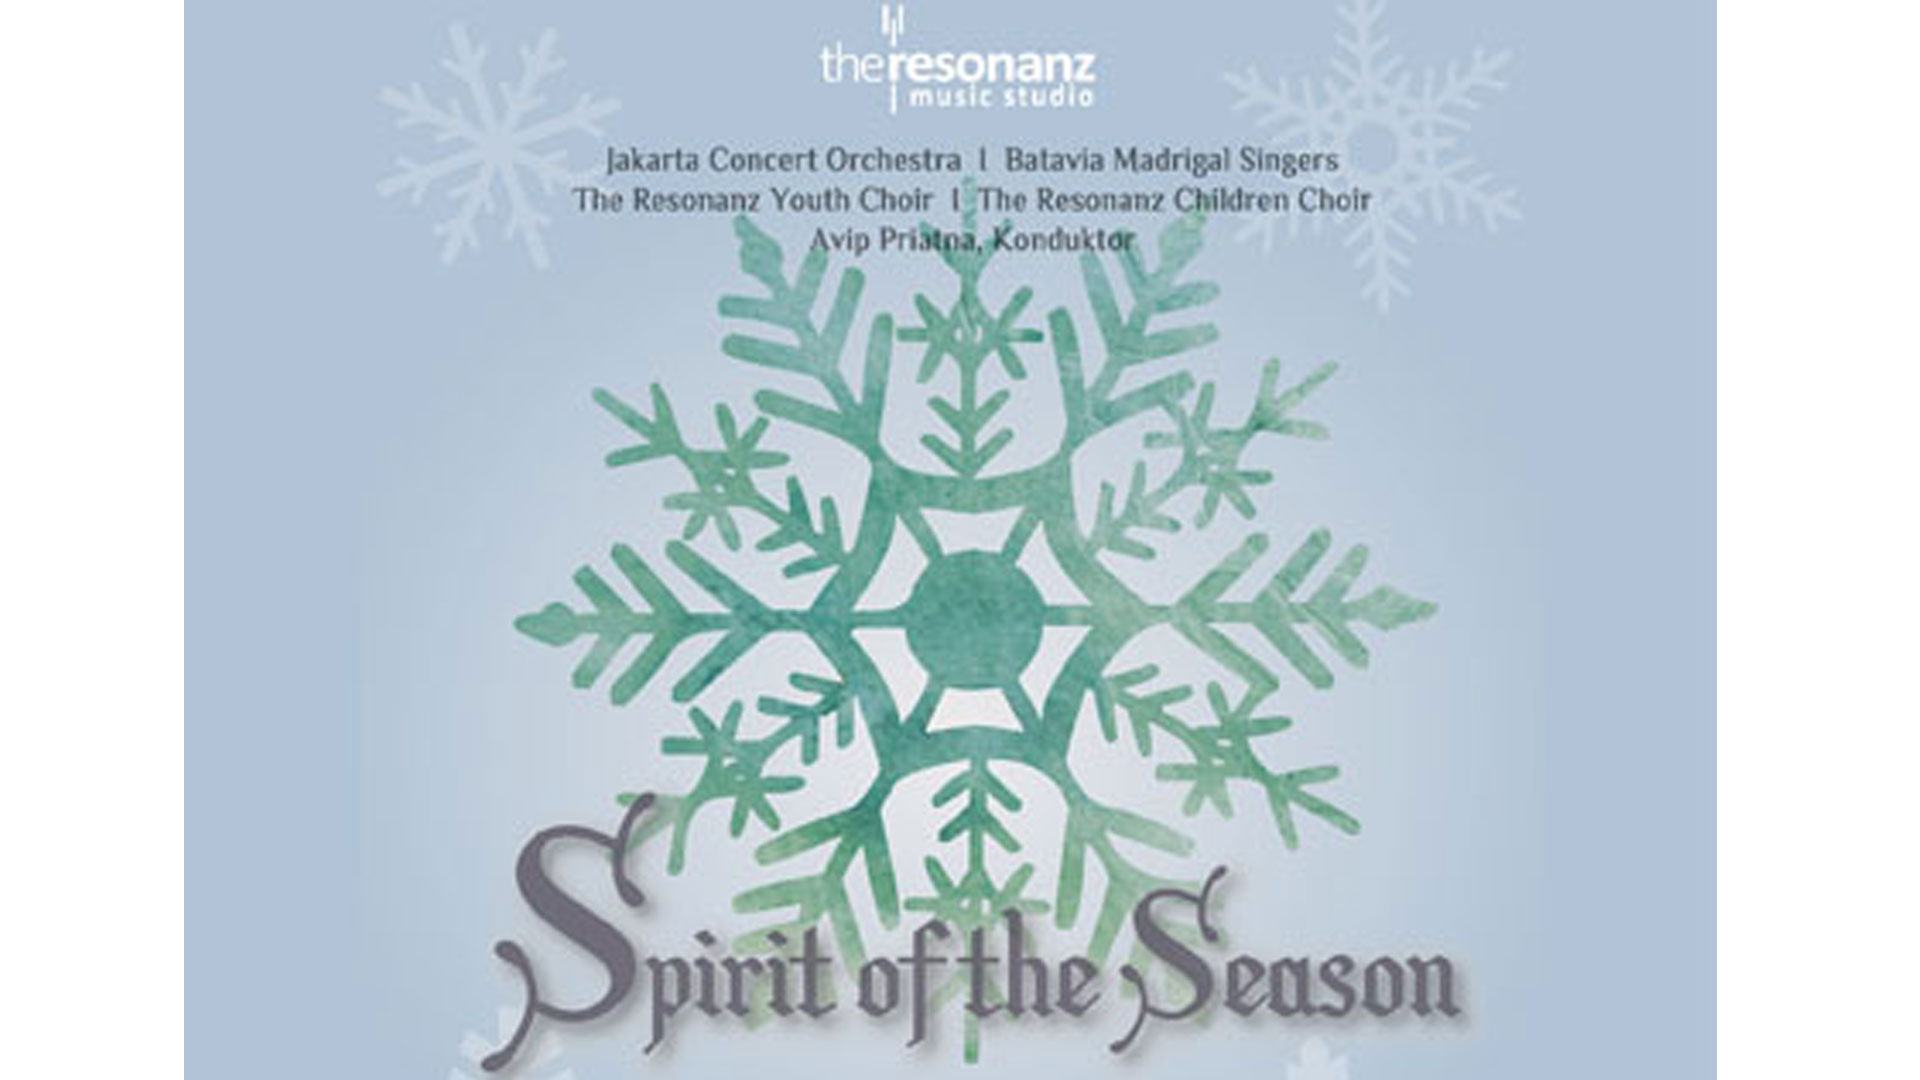 Spirit of the Season - Christmas Concert